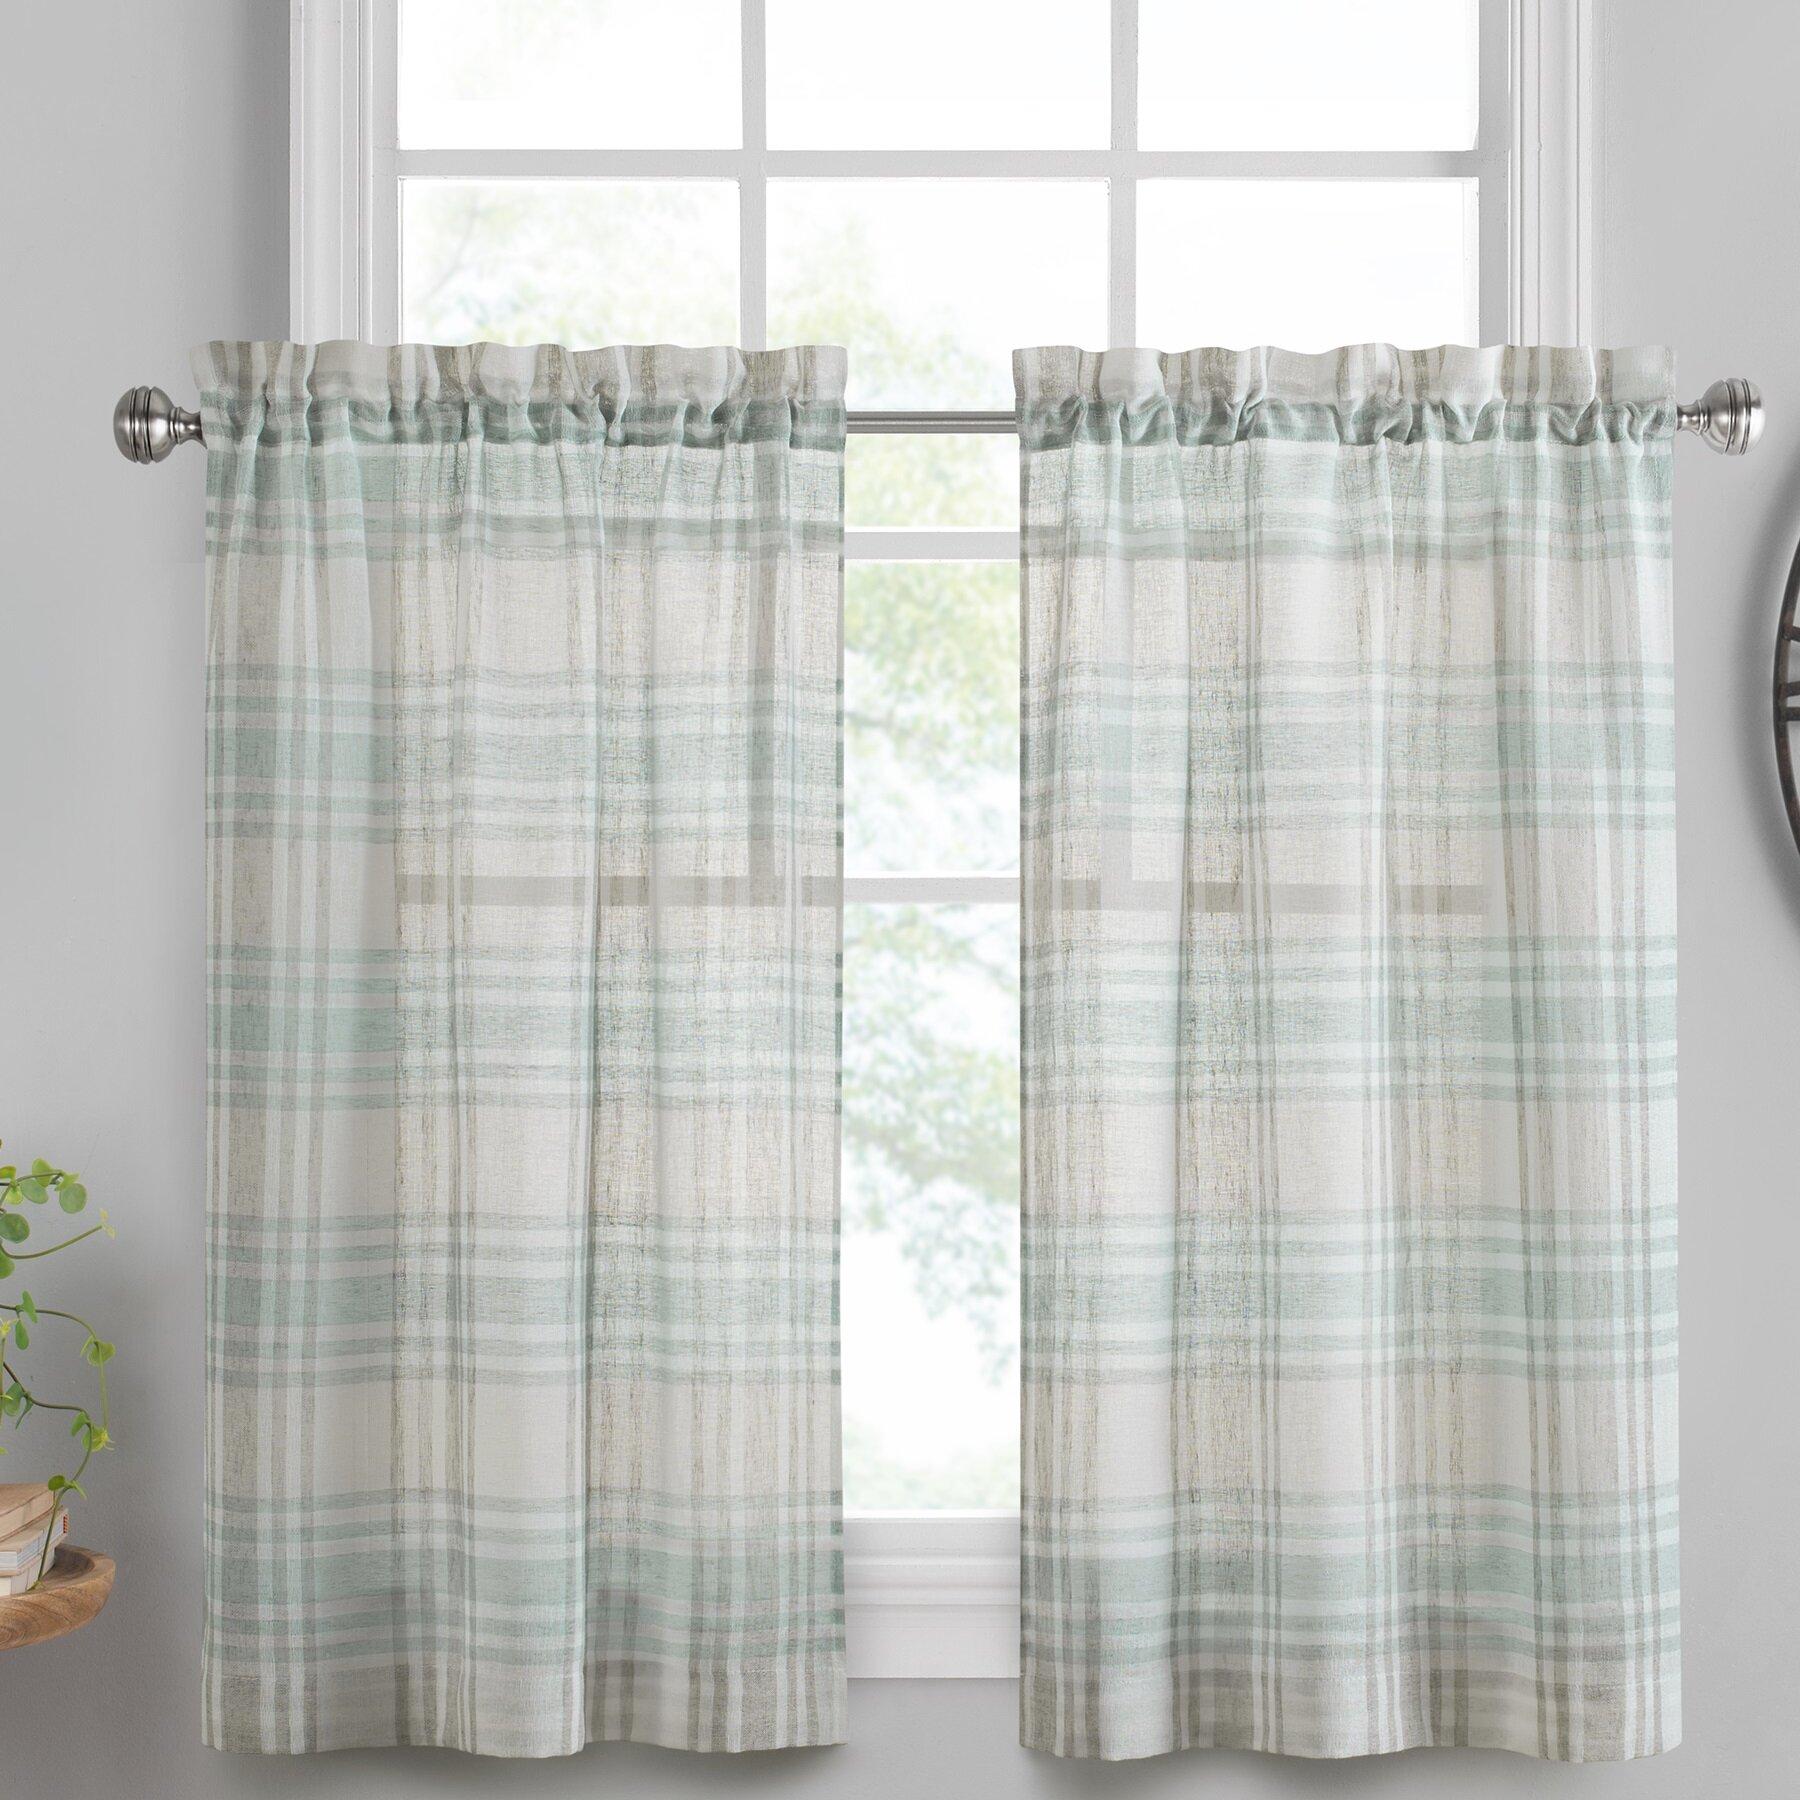 Gracie Oaks Sutton Window Cafe Curtain Reviews Wayfair